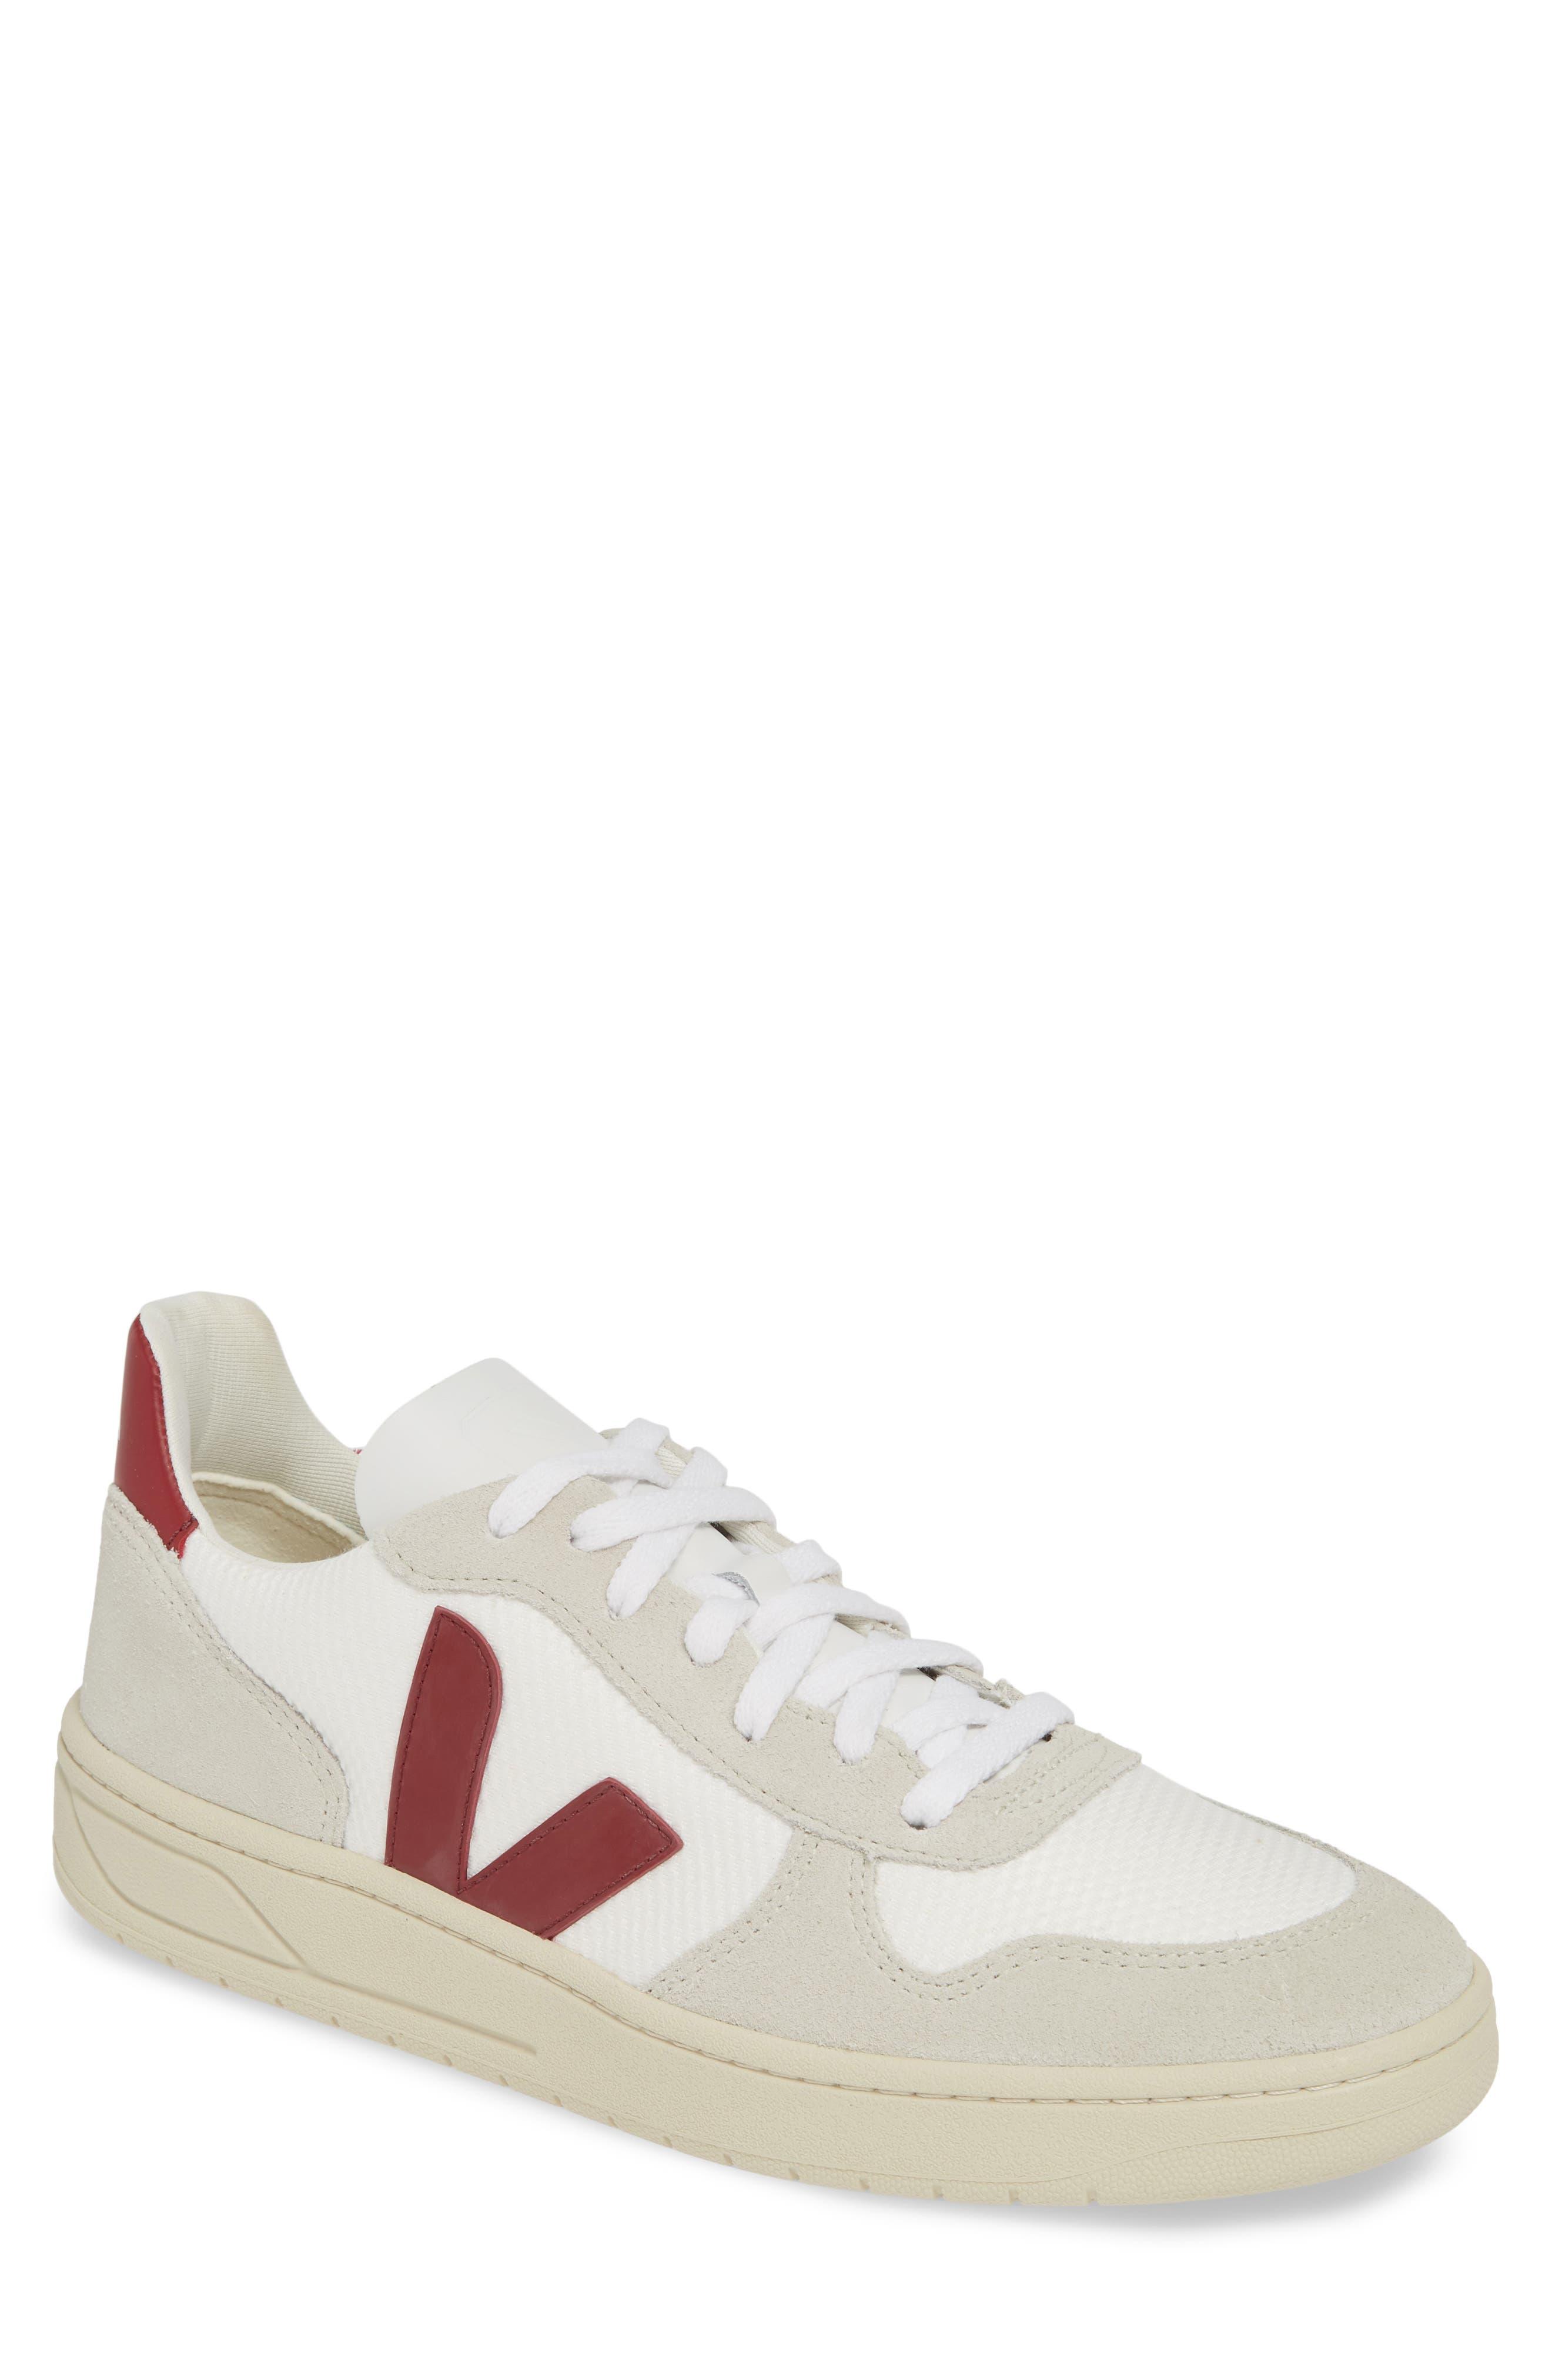 Veja V-10 Sneaker, White